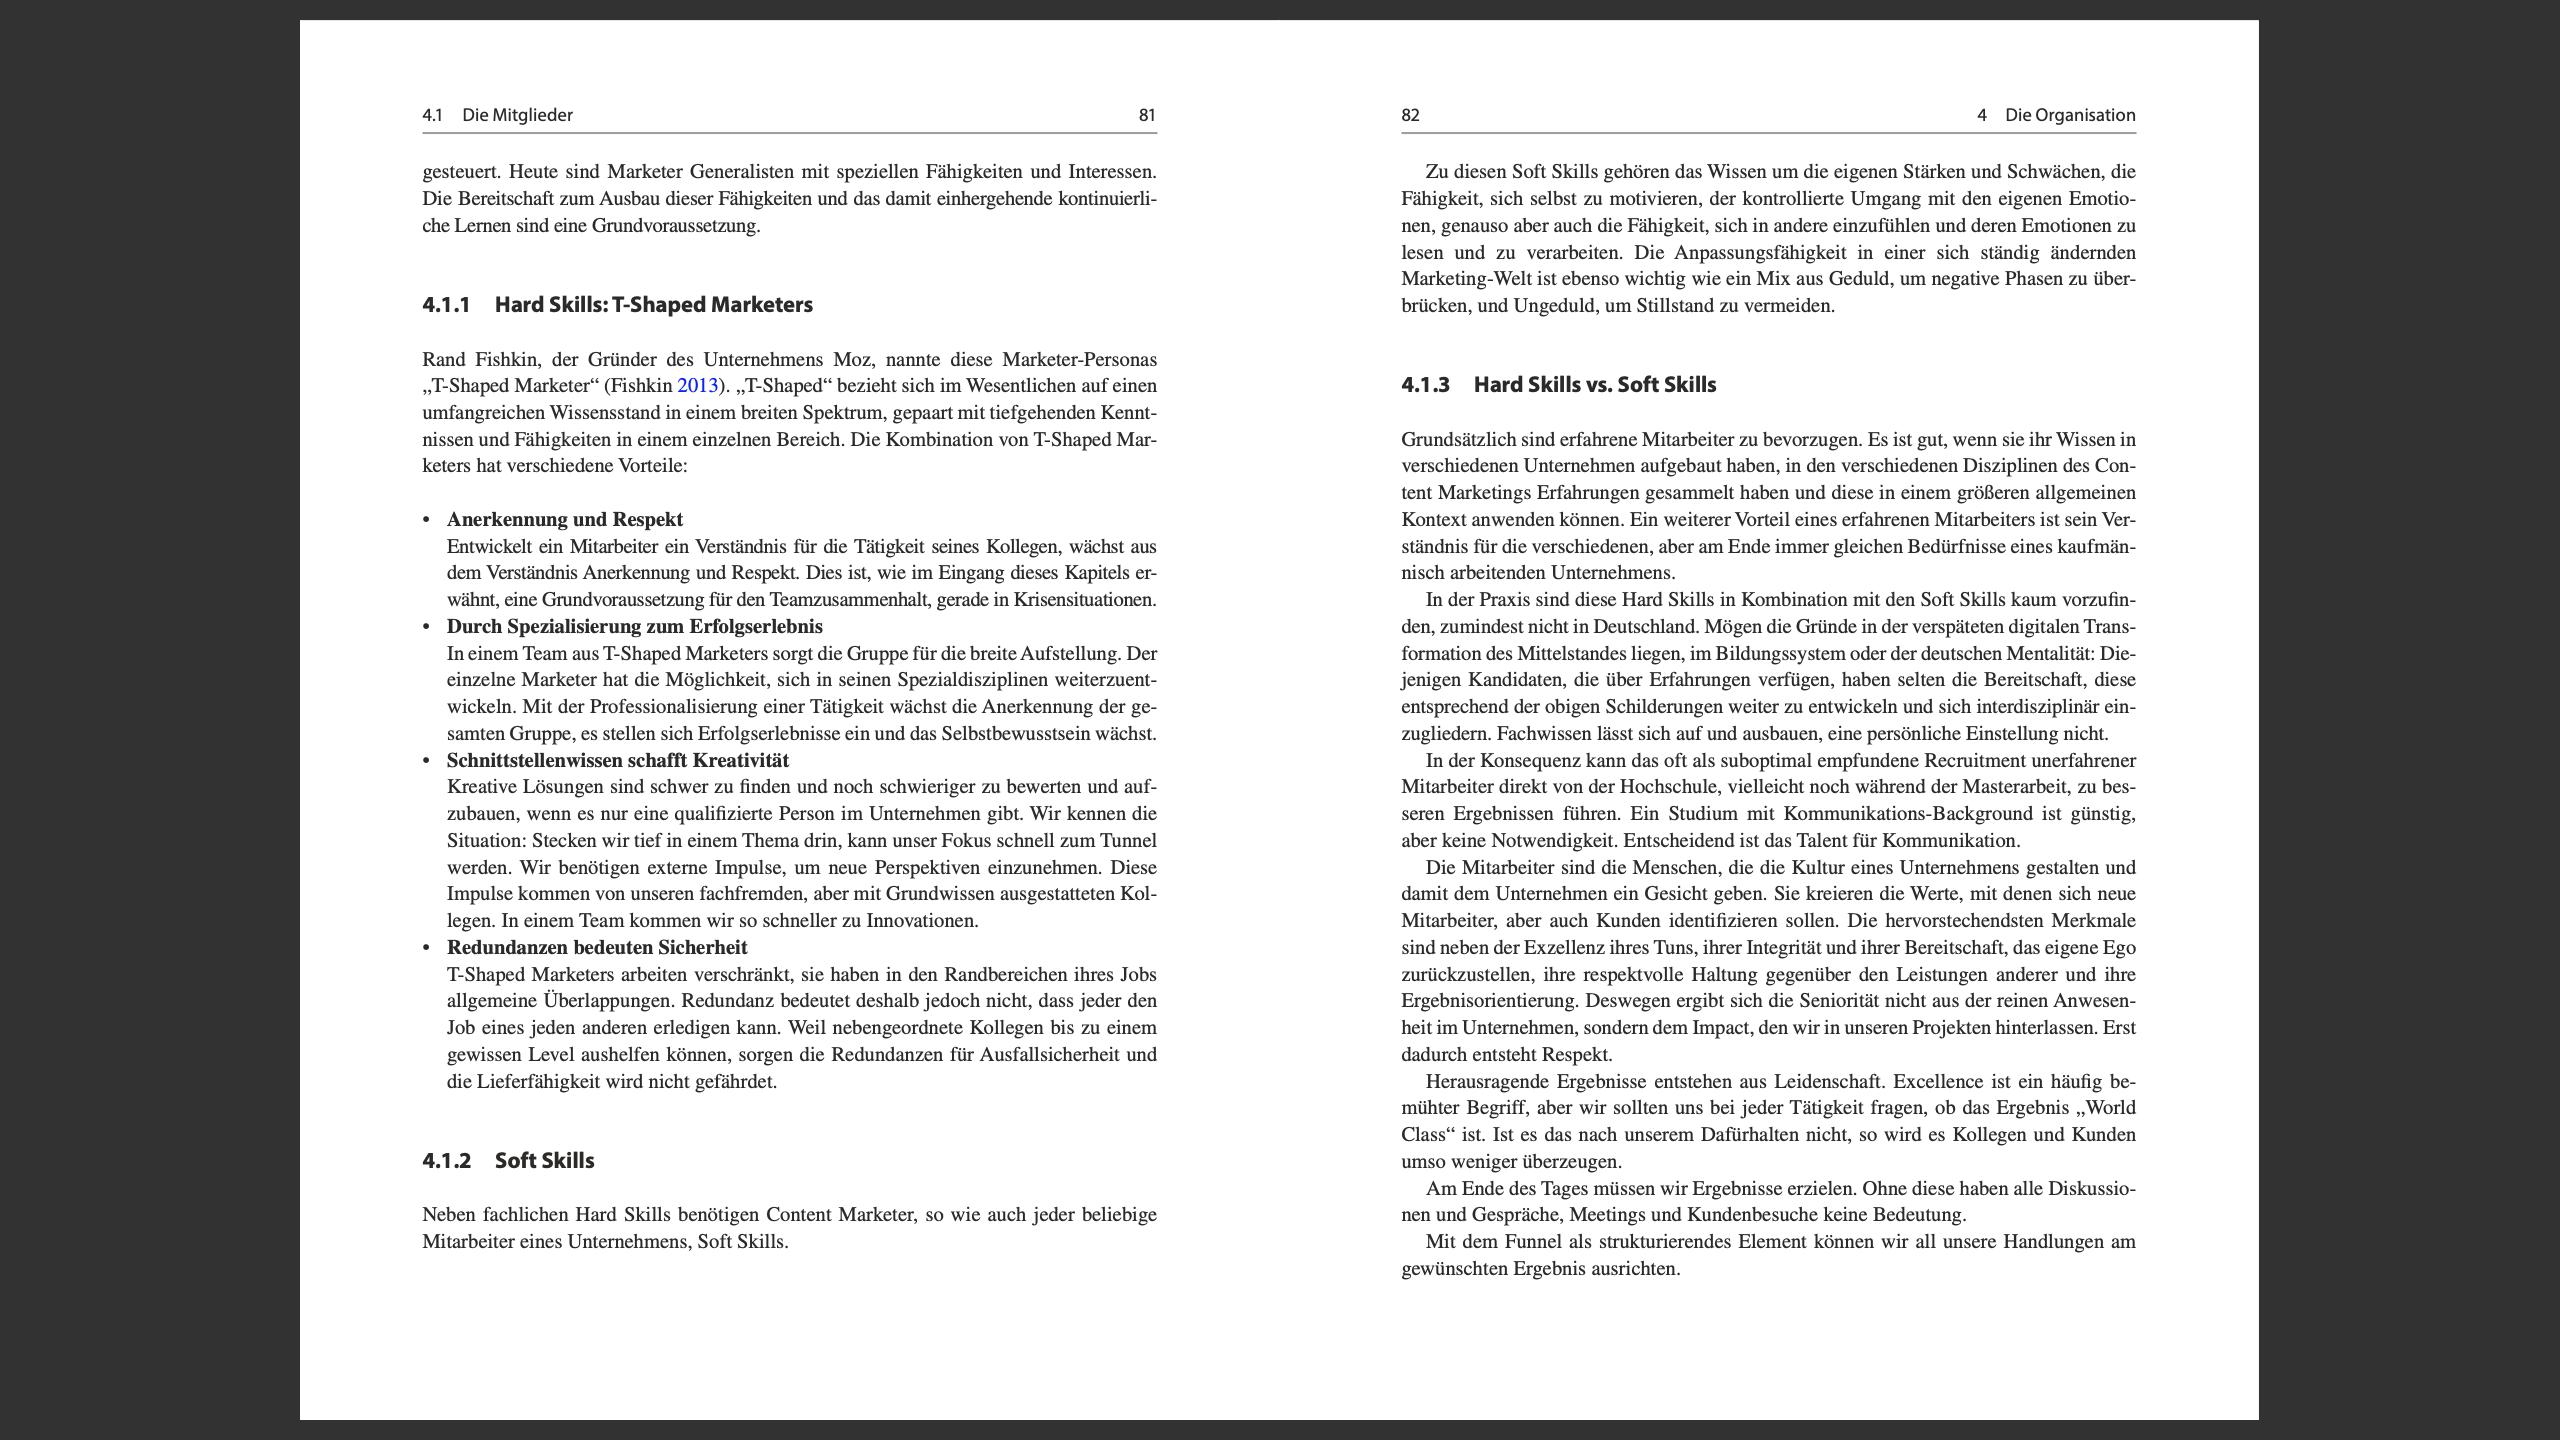 7-Methodisches-Content-Marketing-Gerrit-Grunert